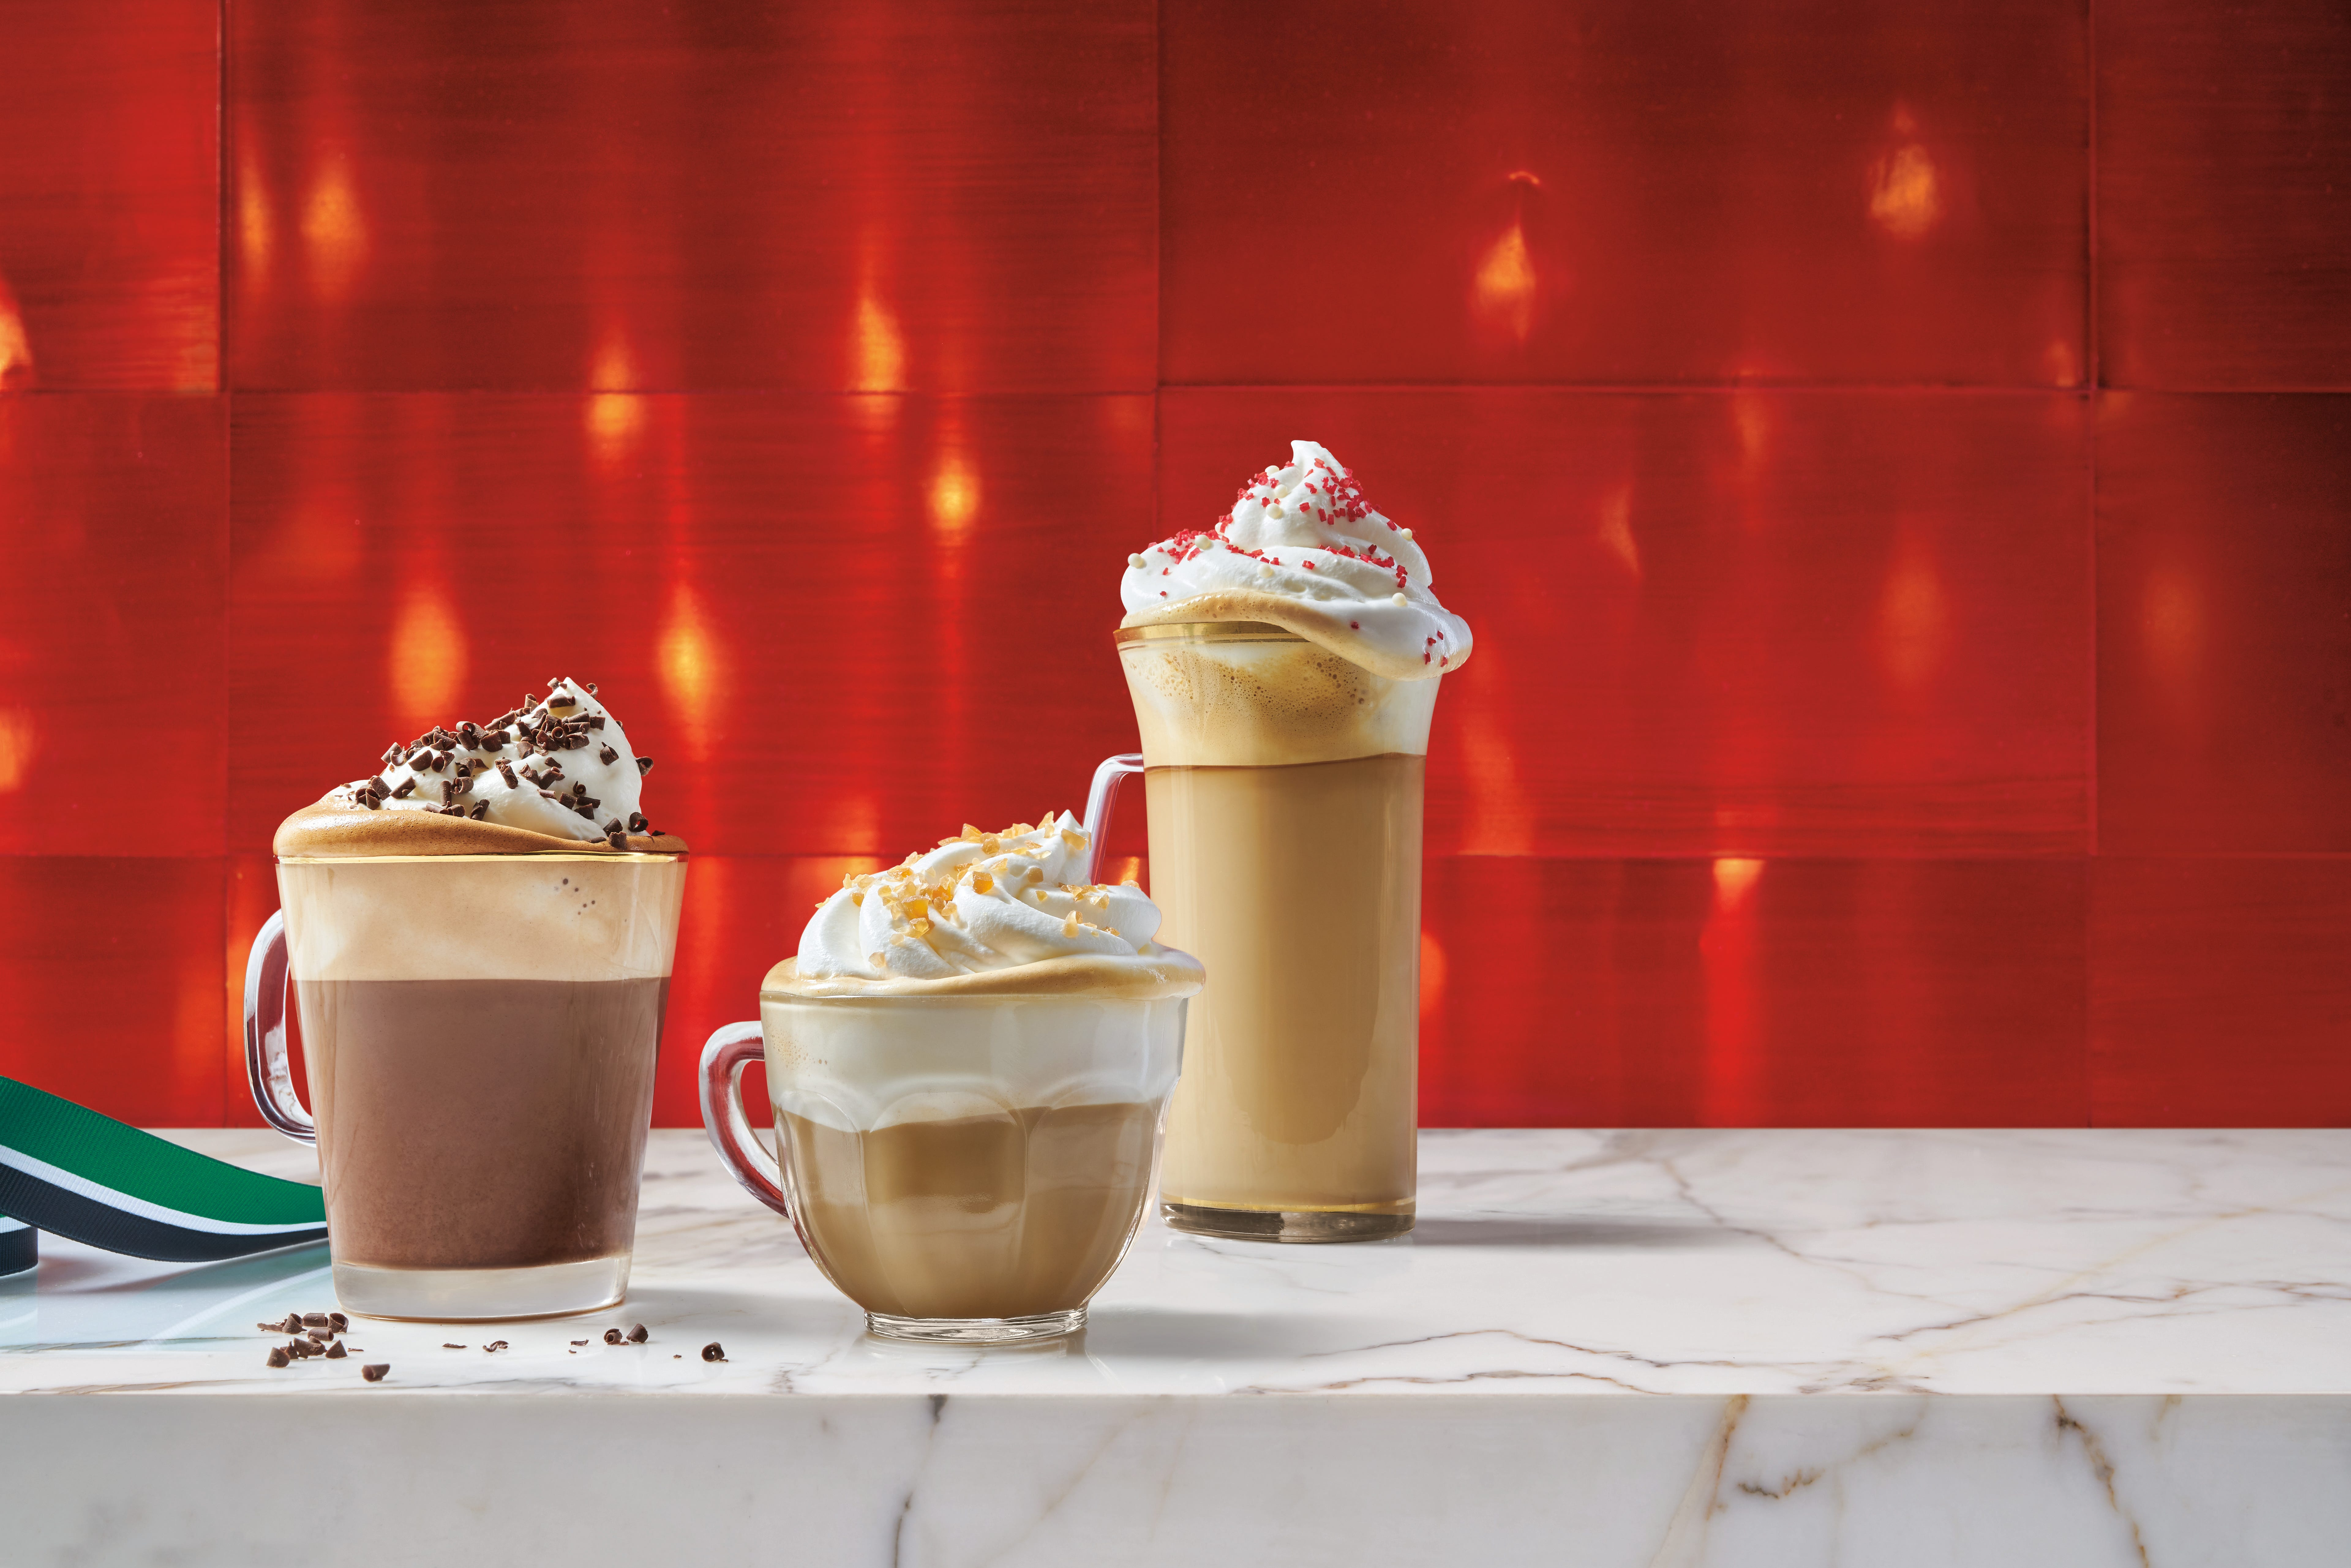 Starbucks Christmas Menu.Starbucks Holiday Menu 2018 New Seasonal Food Drinks